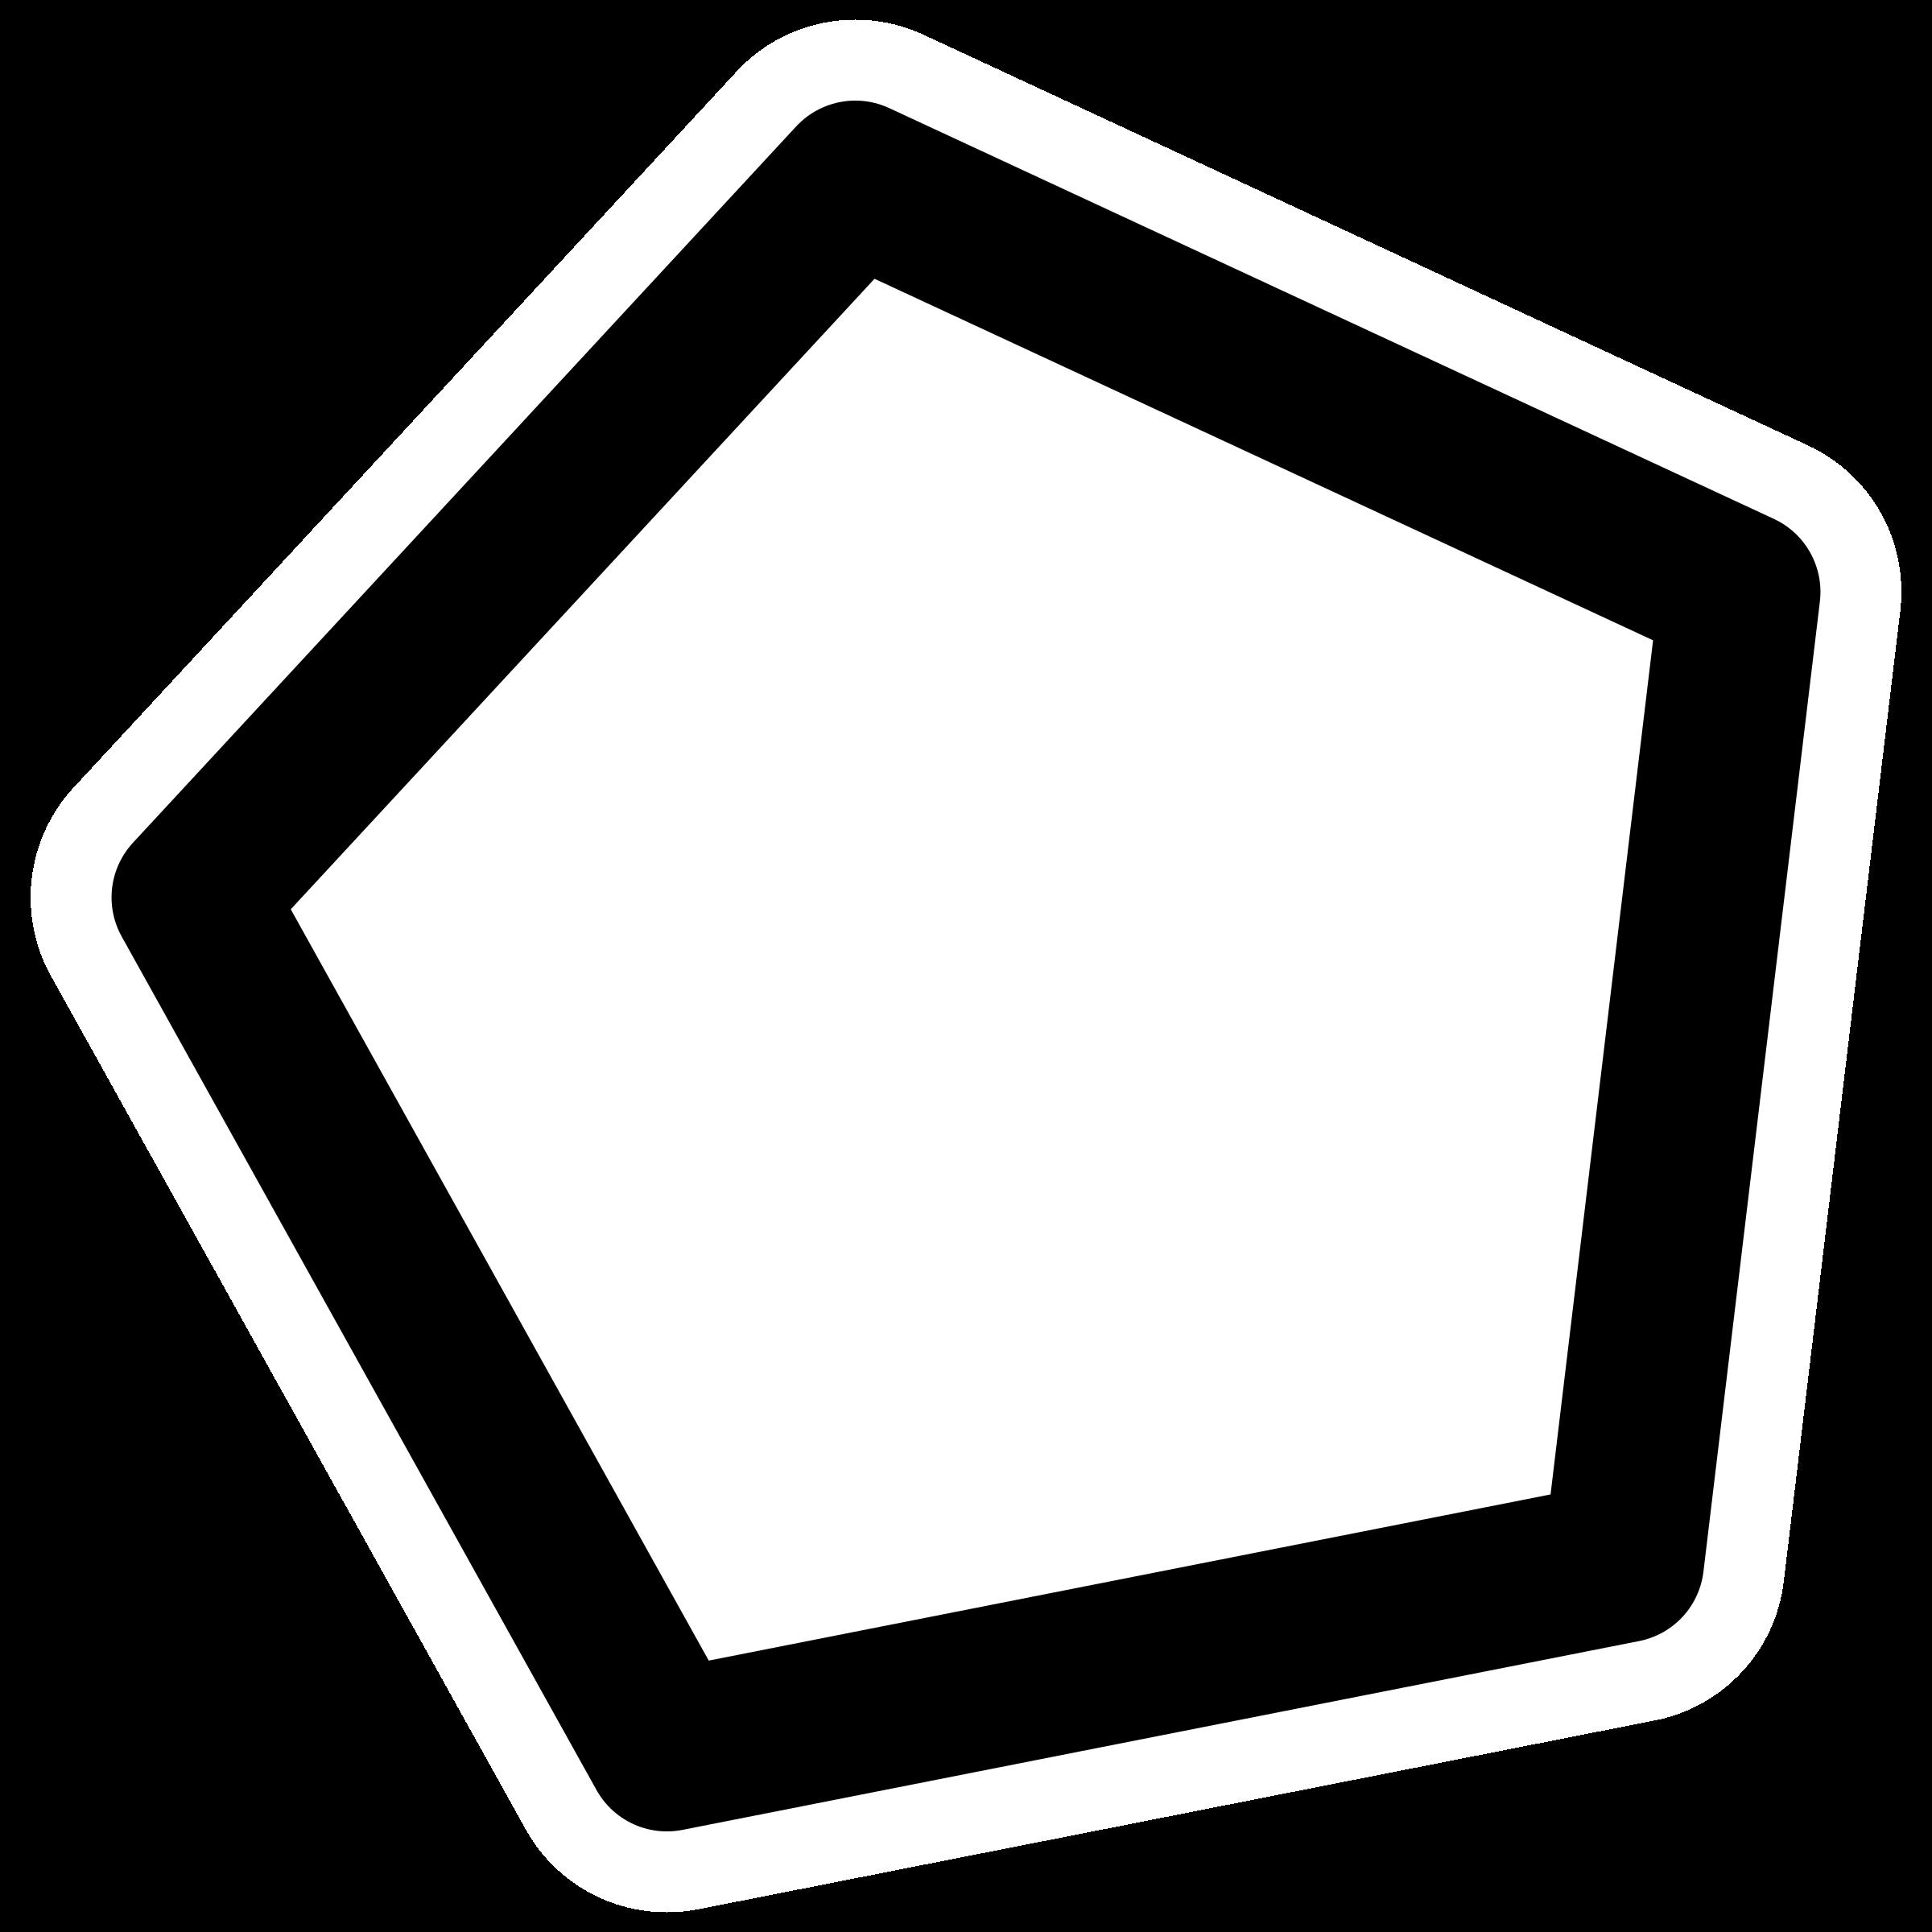 Polygon clipart #13